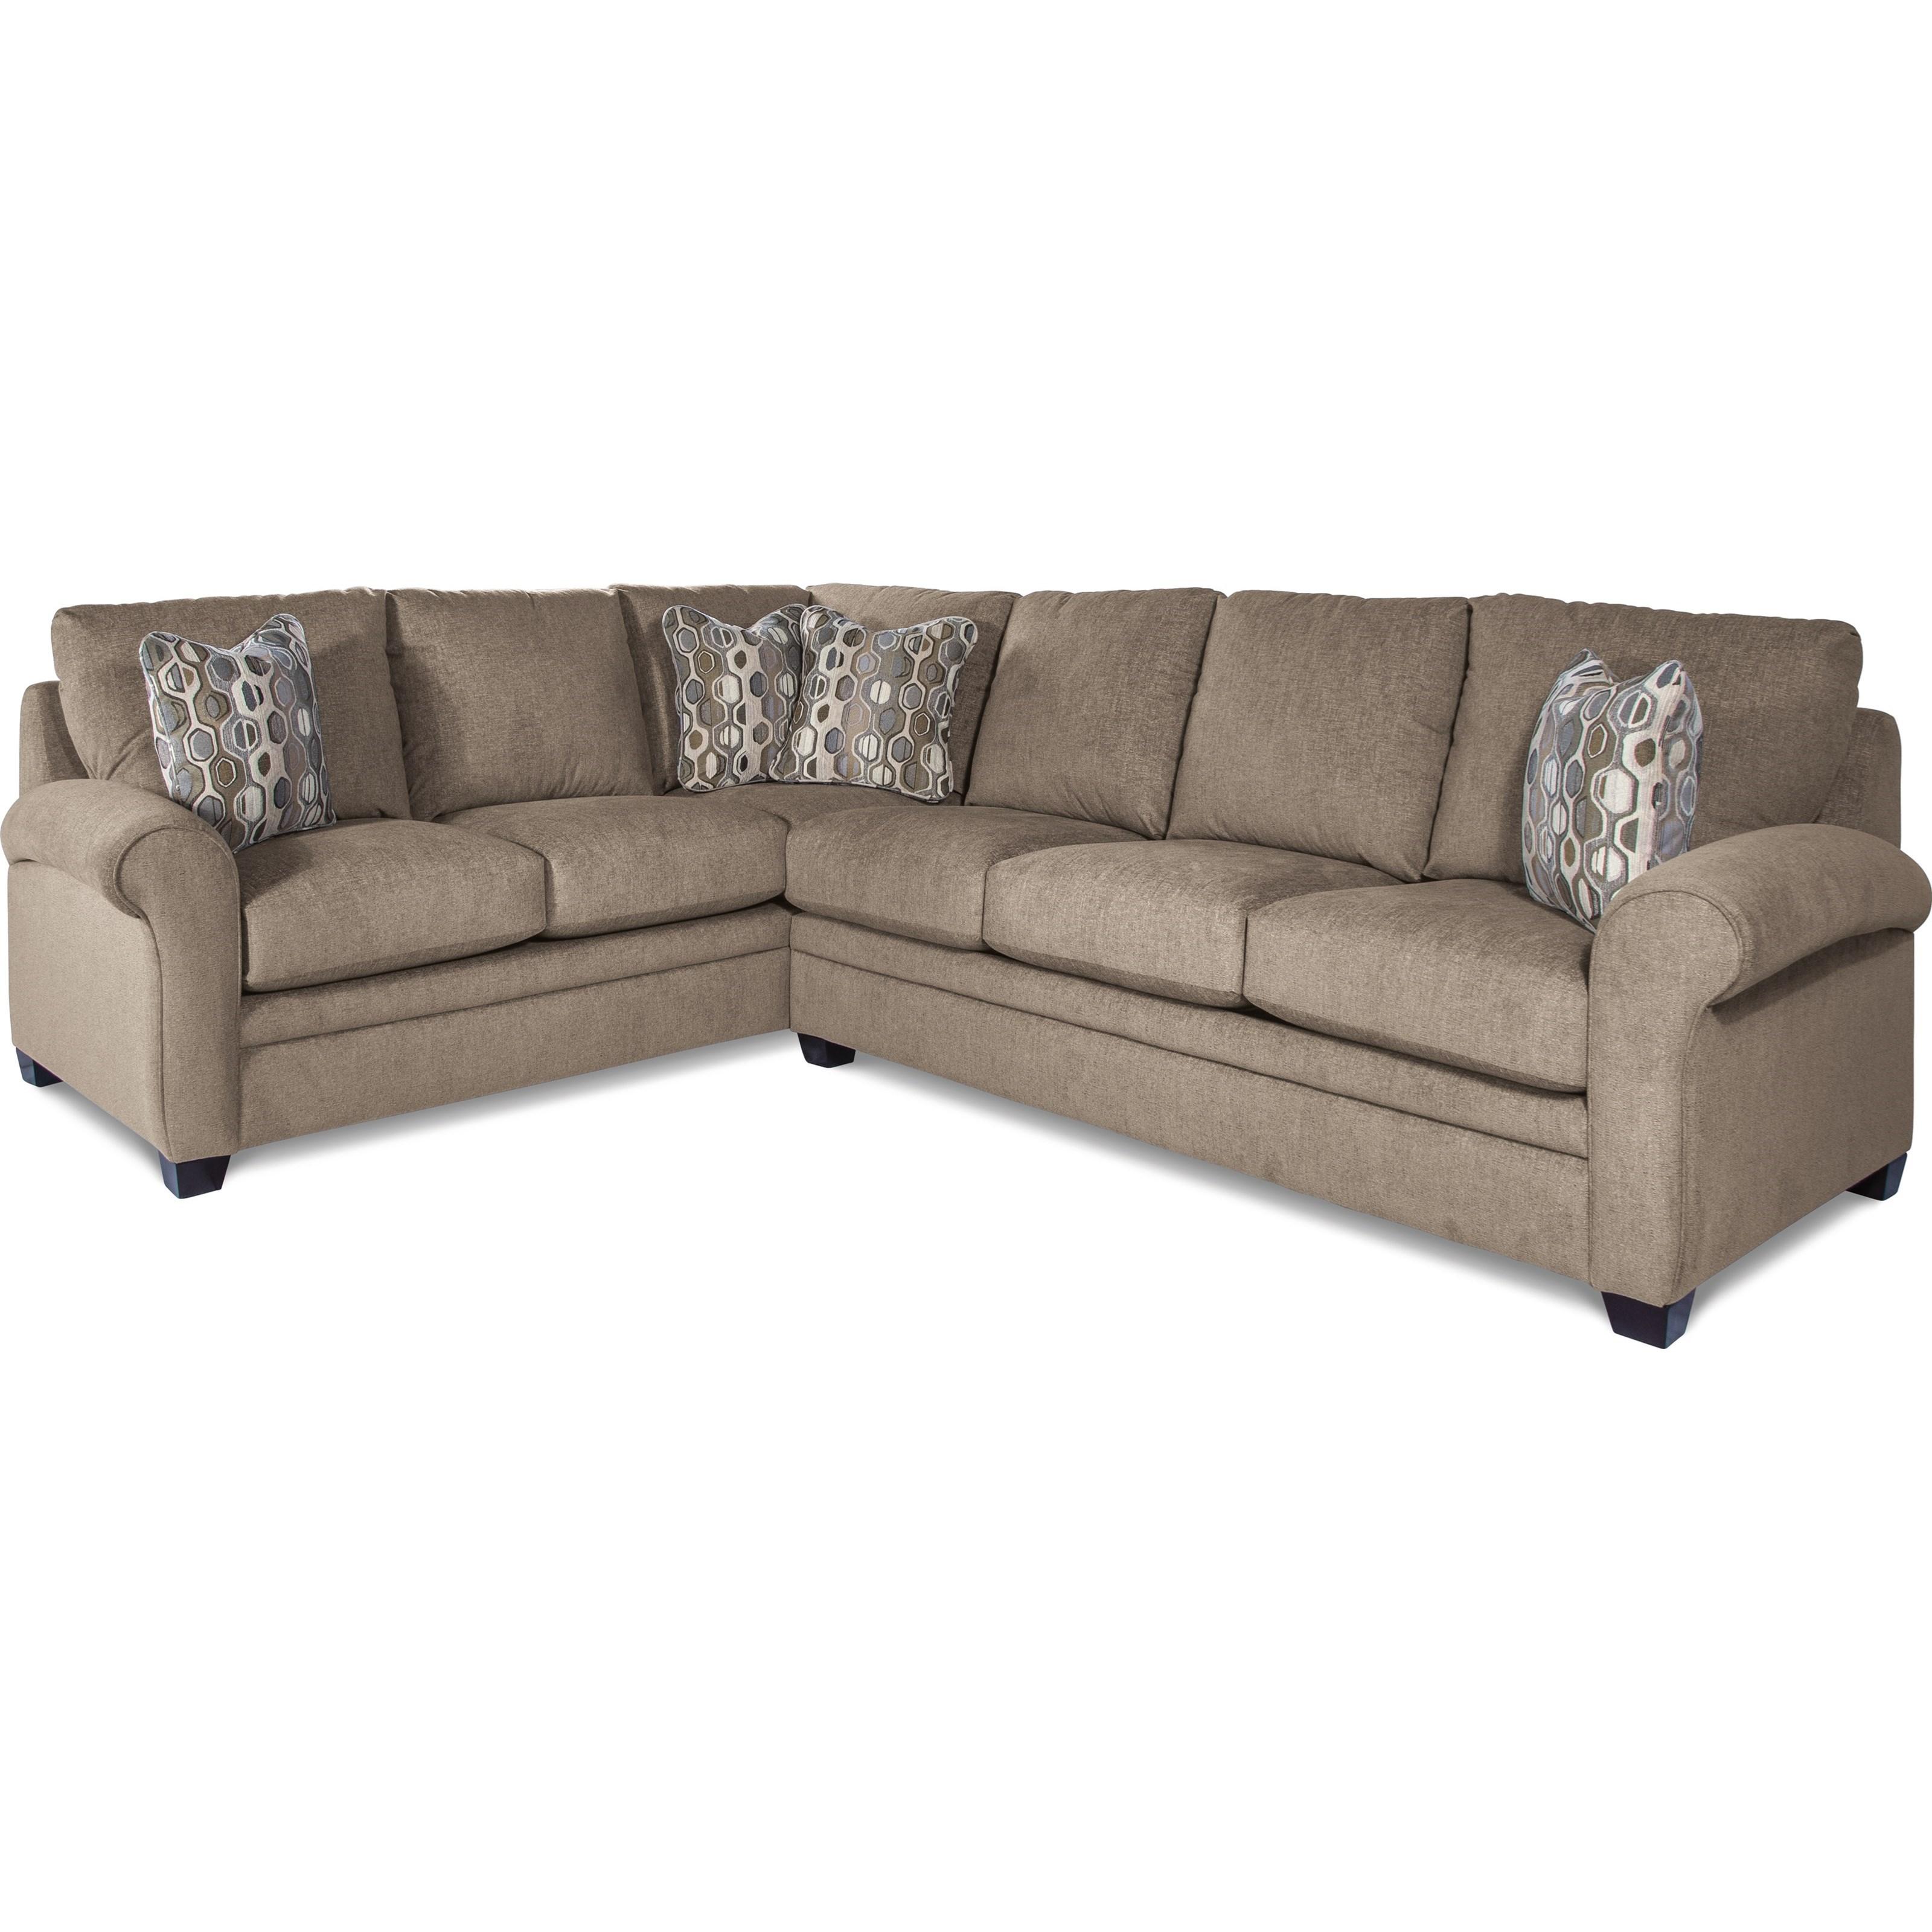 Garrett Casual Two Piece Sectional Sofa by La-Z-Boy